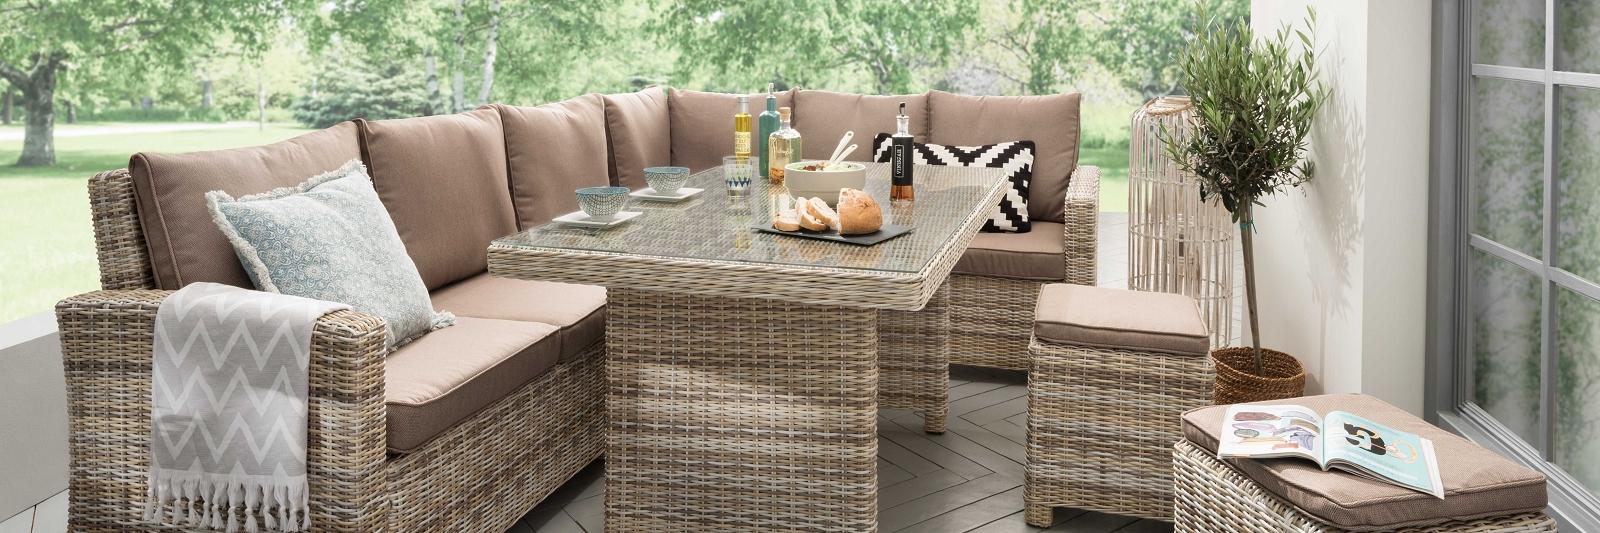 Polyrattan Loungegruppe in modernem Design